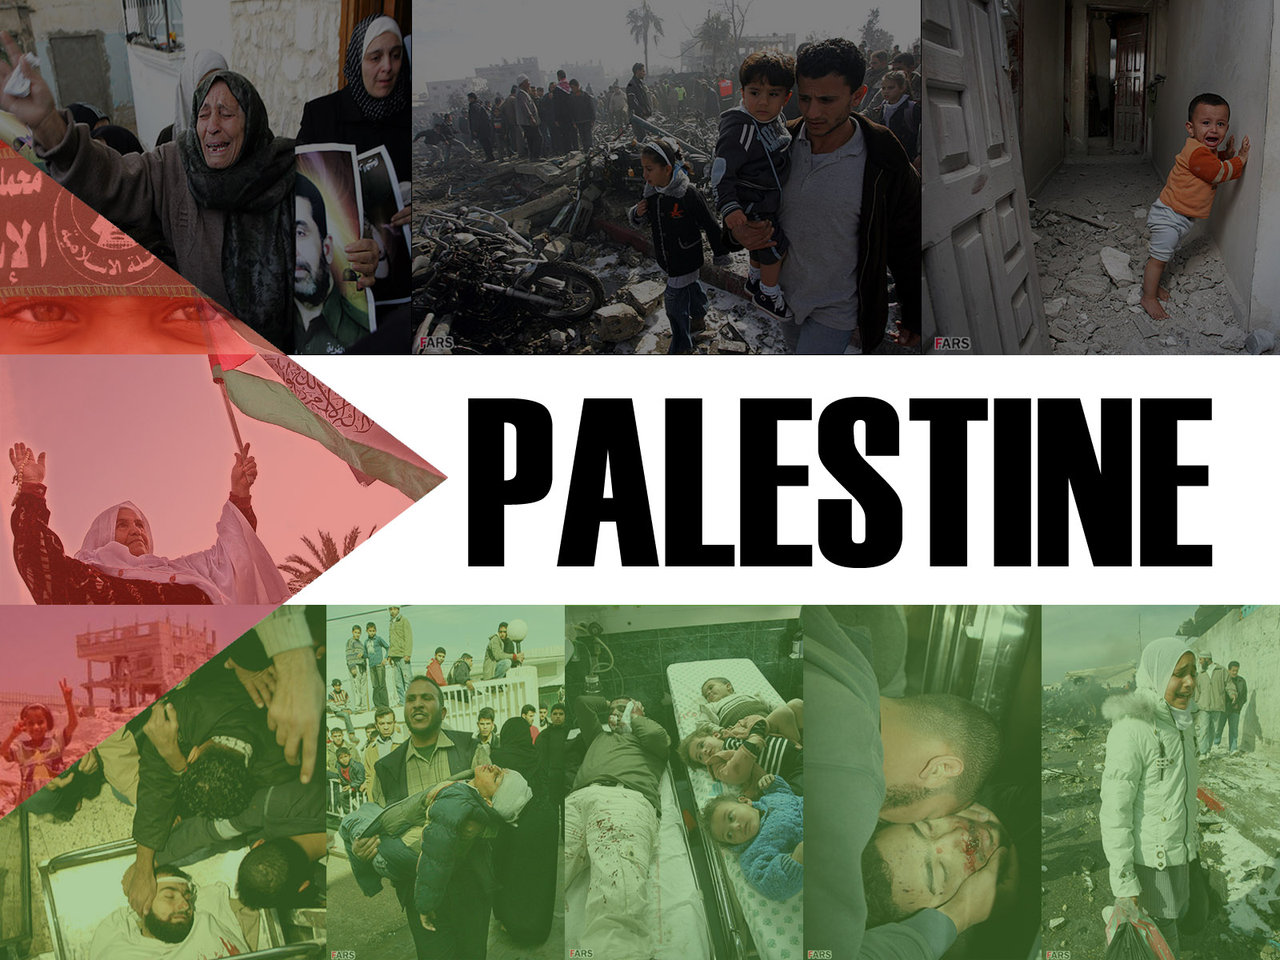 http://2.bp.blogspot.com/-_pqcSglXrnc/TuwHoYvZHYI/AAAAAAAAAEc/8bokUr45mZs/s1600/palestine_photo_wallpaper_by_zealousofpeace.jpg